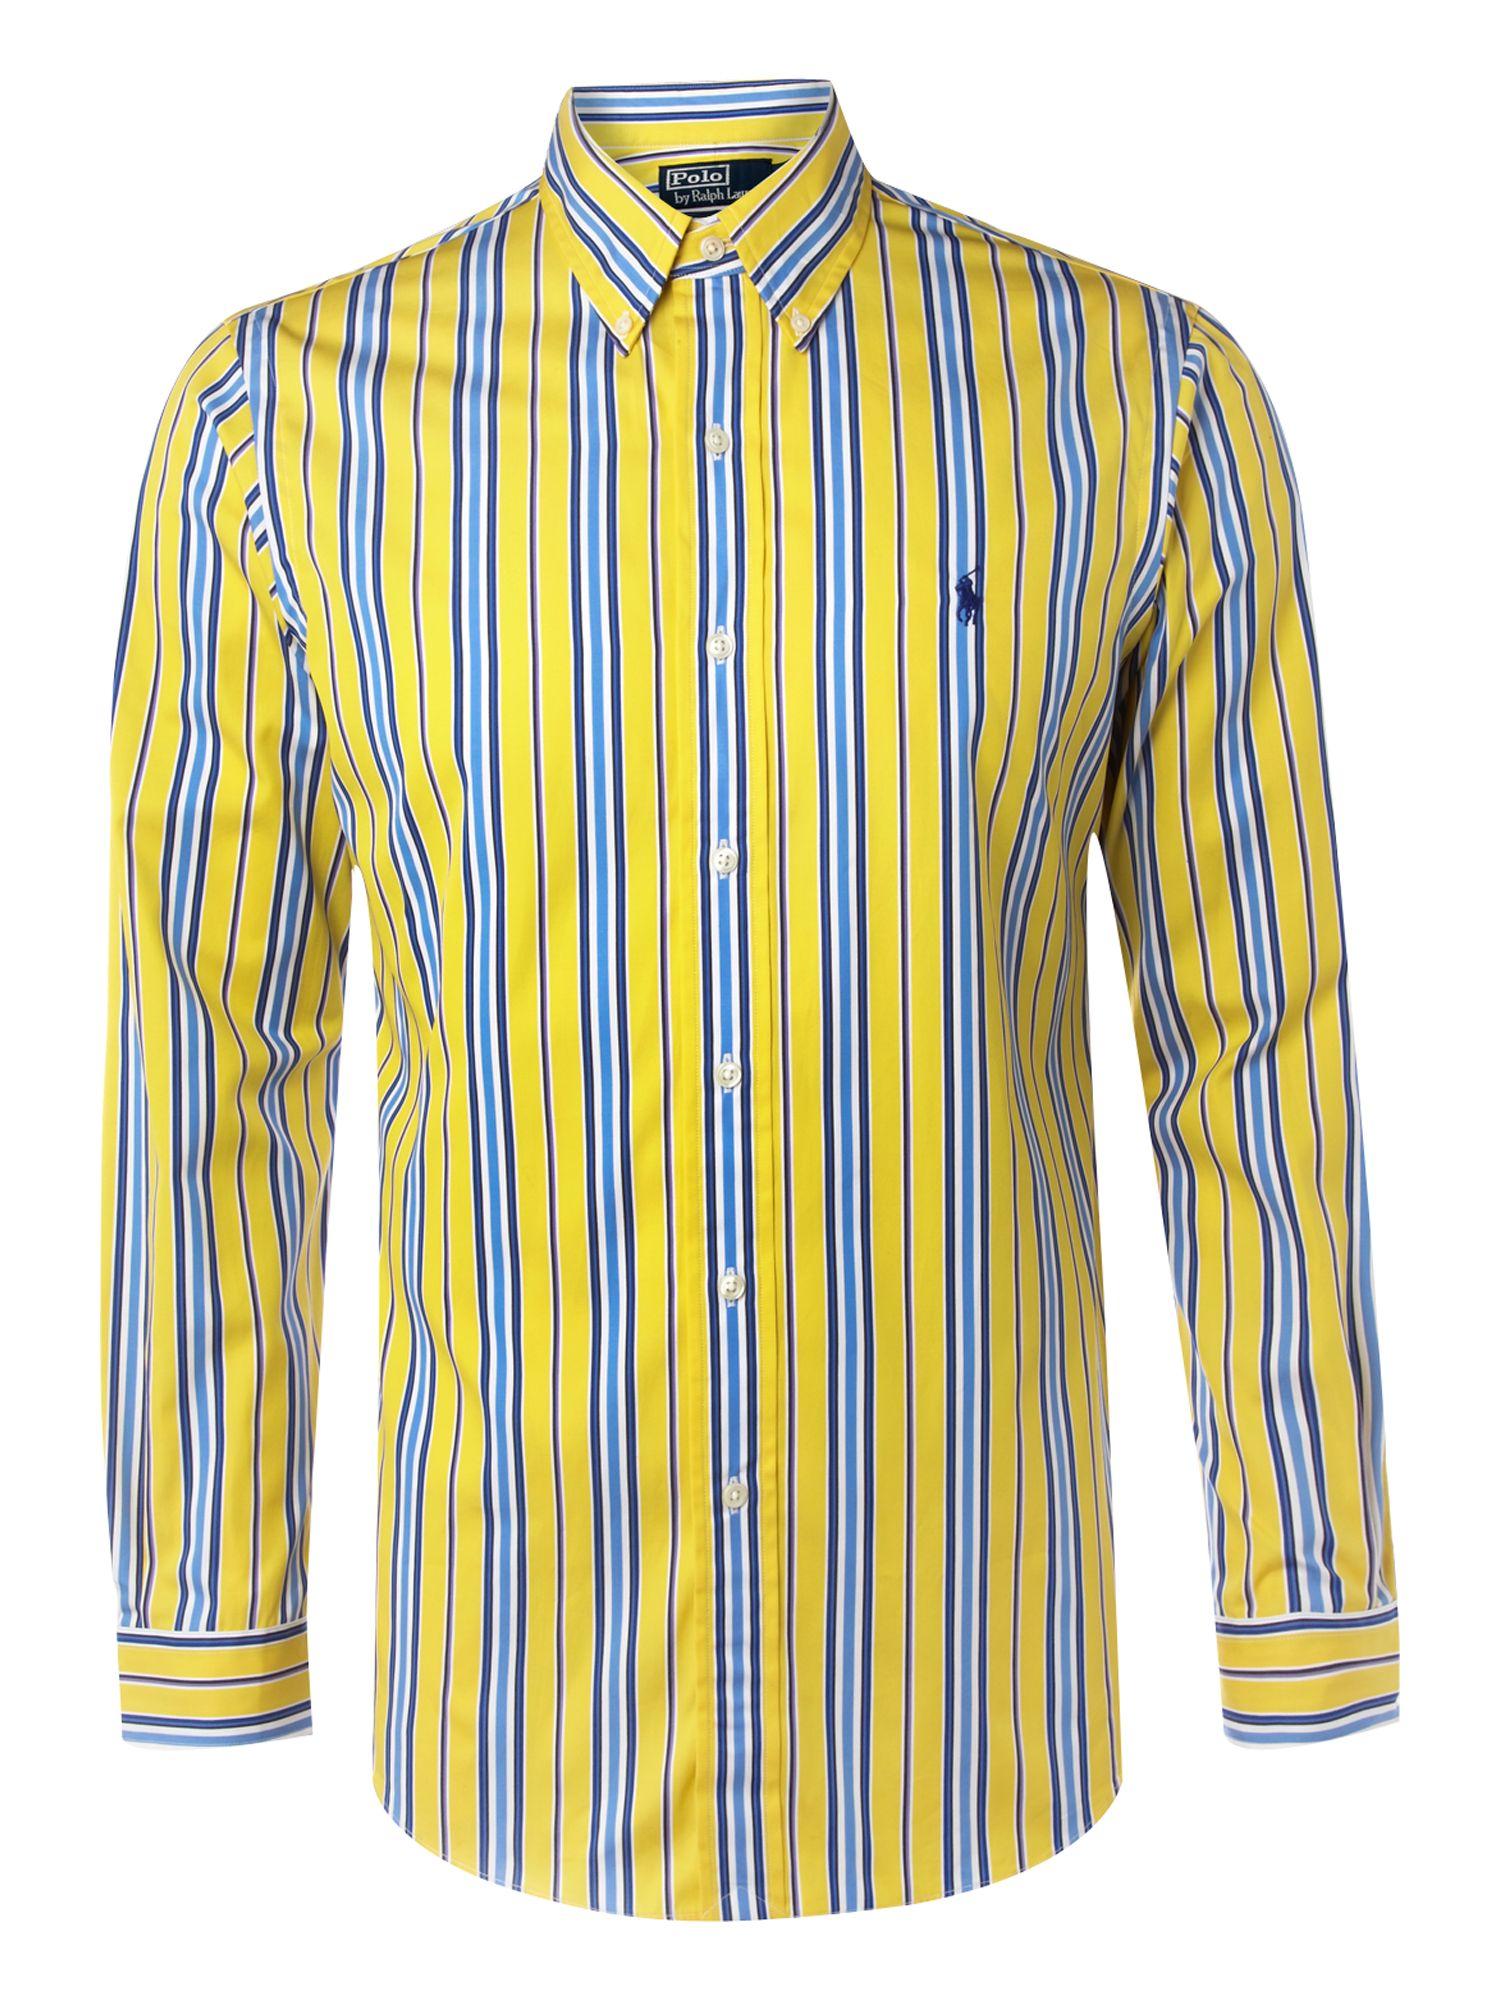 polo ralph lauren custom fit striped cotton poplin dress shirt male models picture. Black Bedroom Furniture Sets. Home Design Ideas